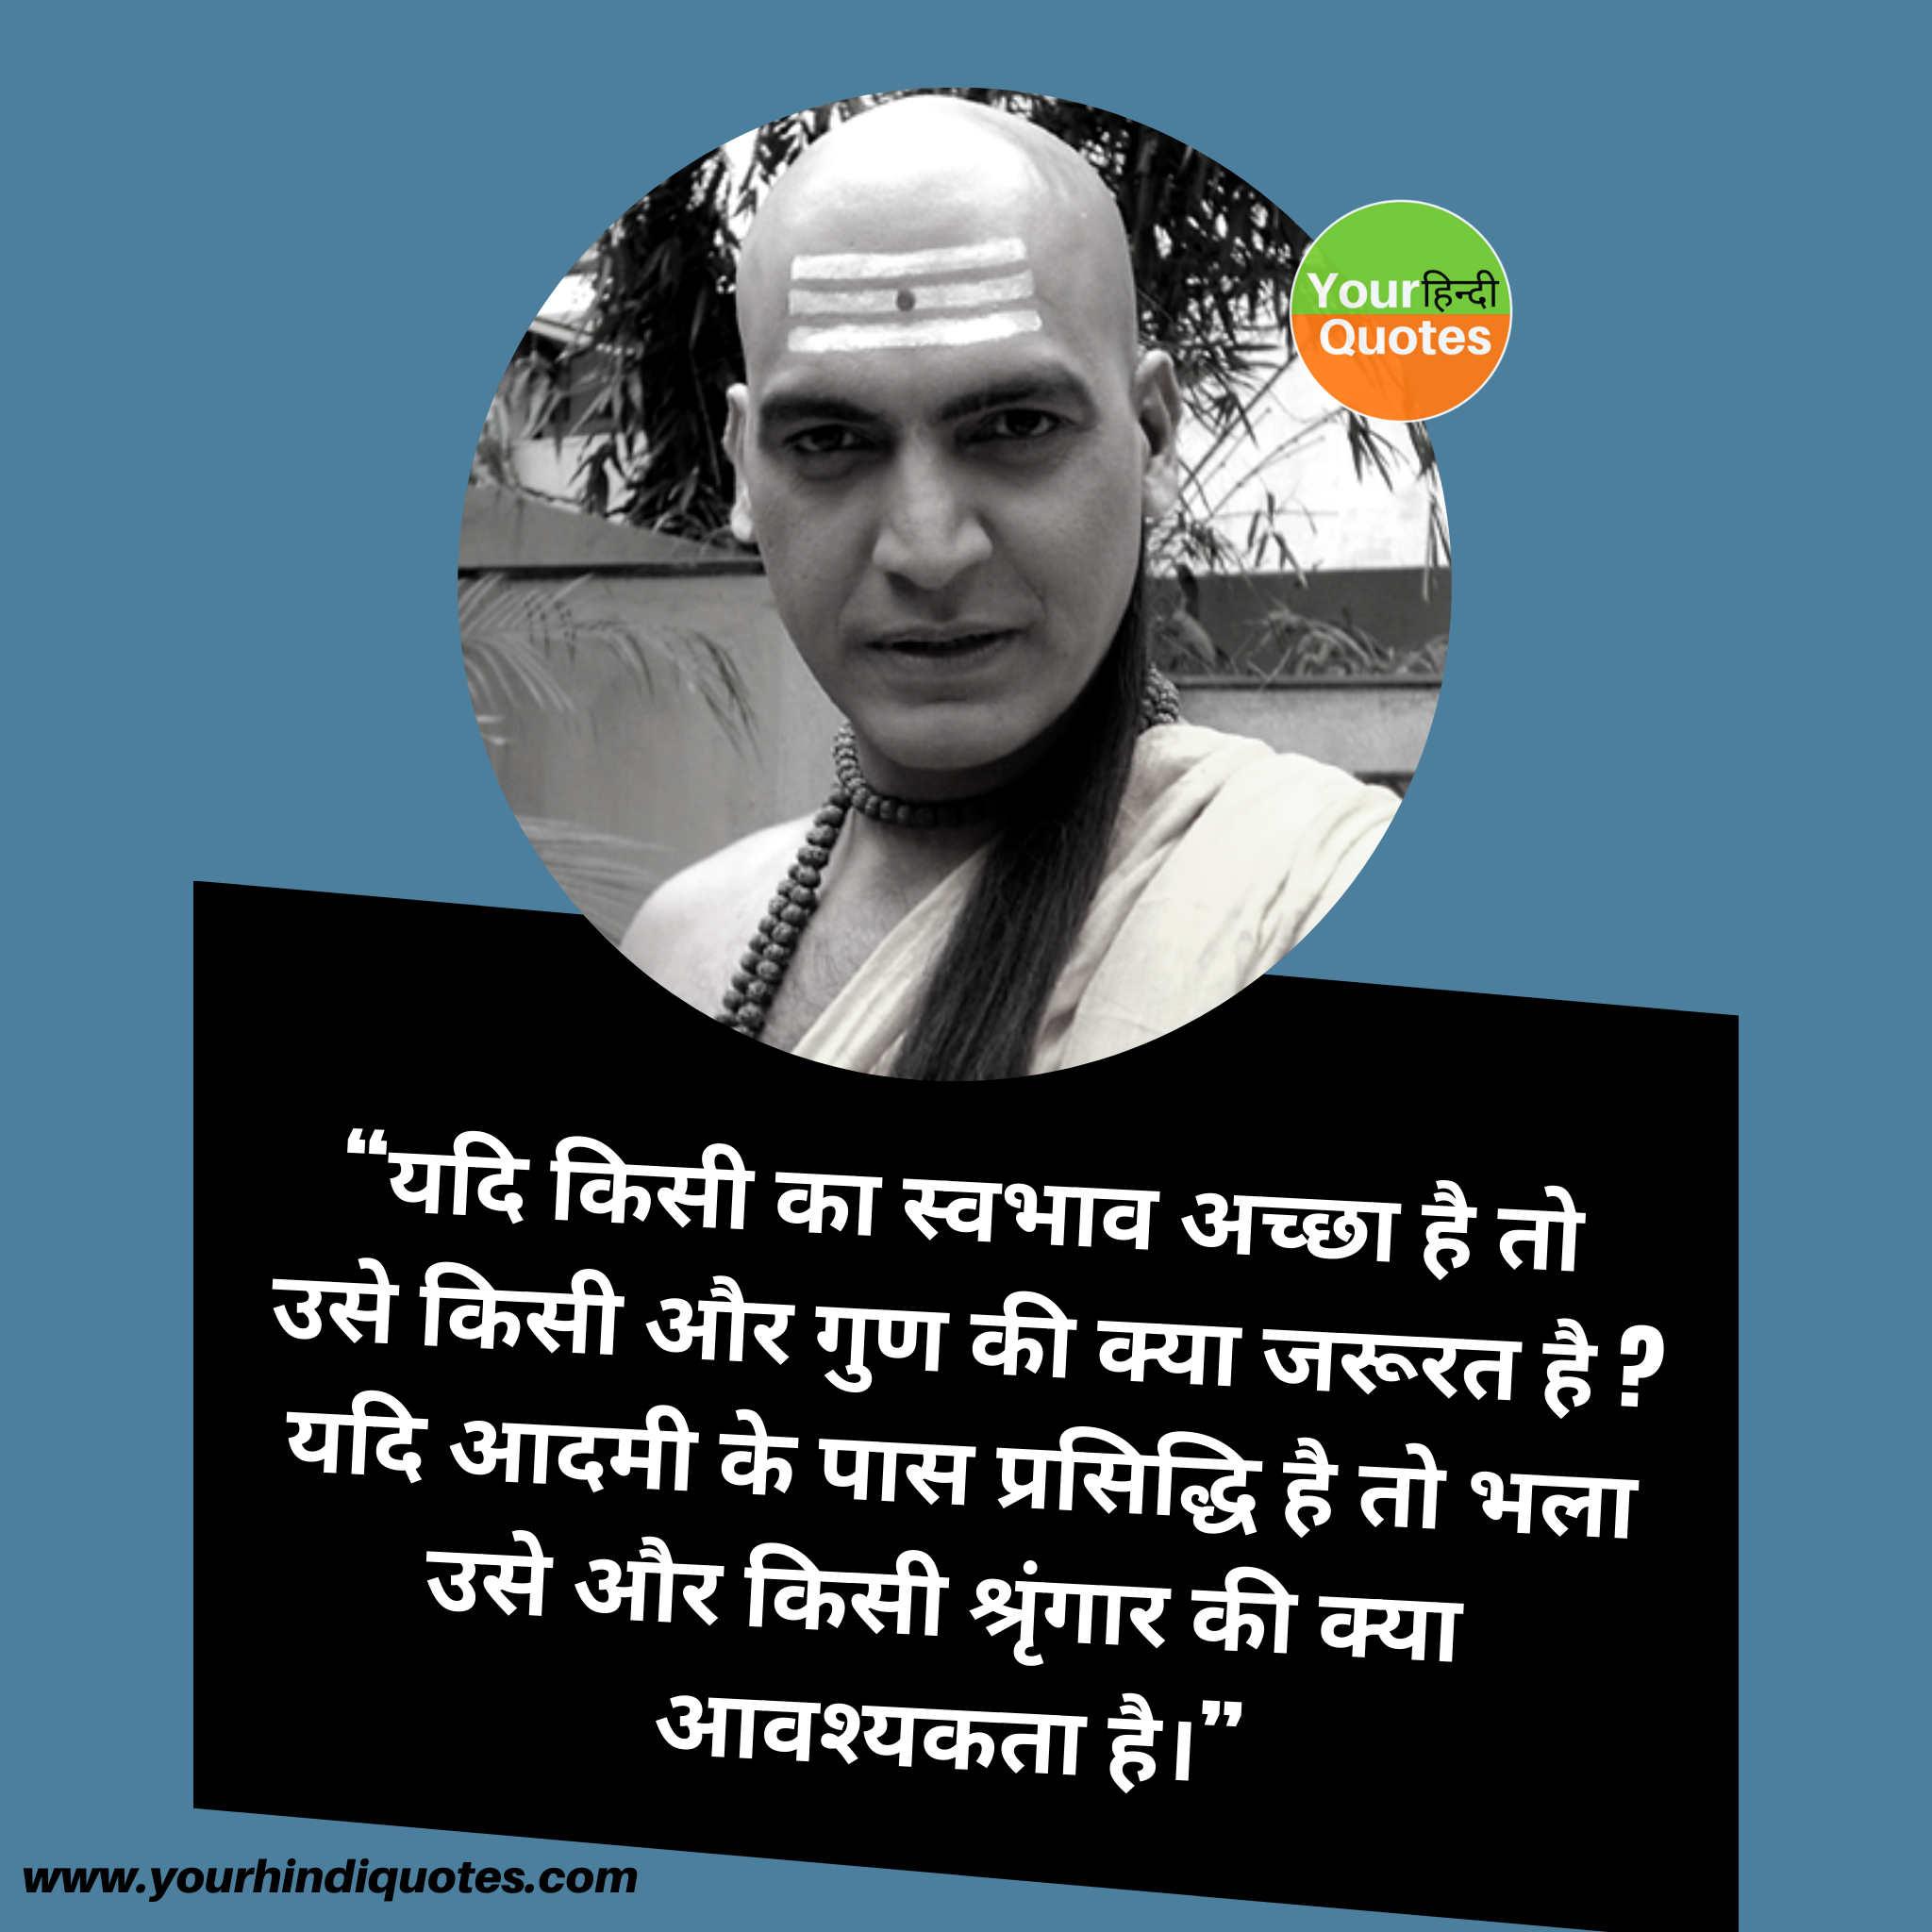 Chanakya Niti Quotes Image